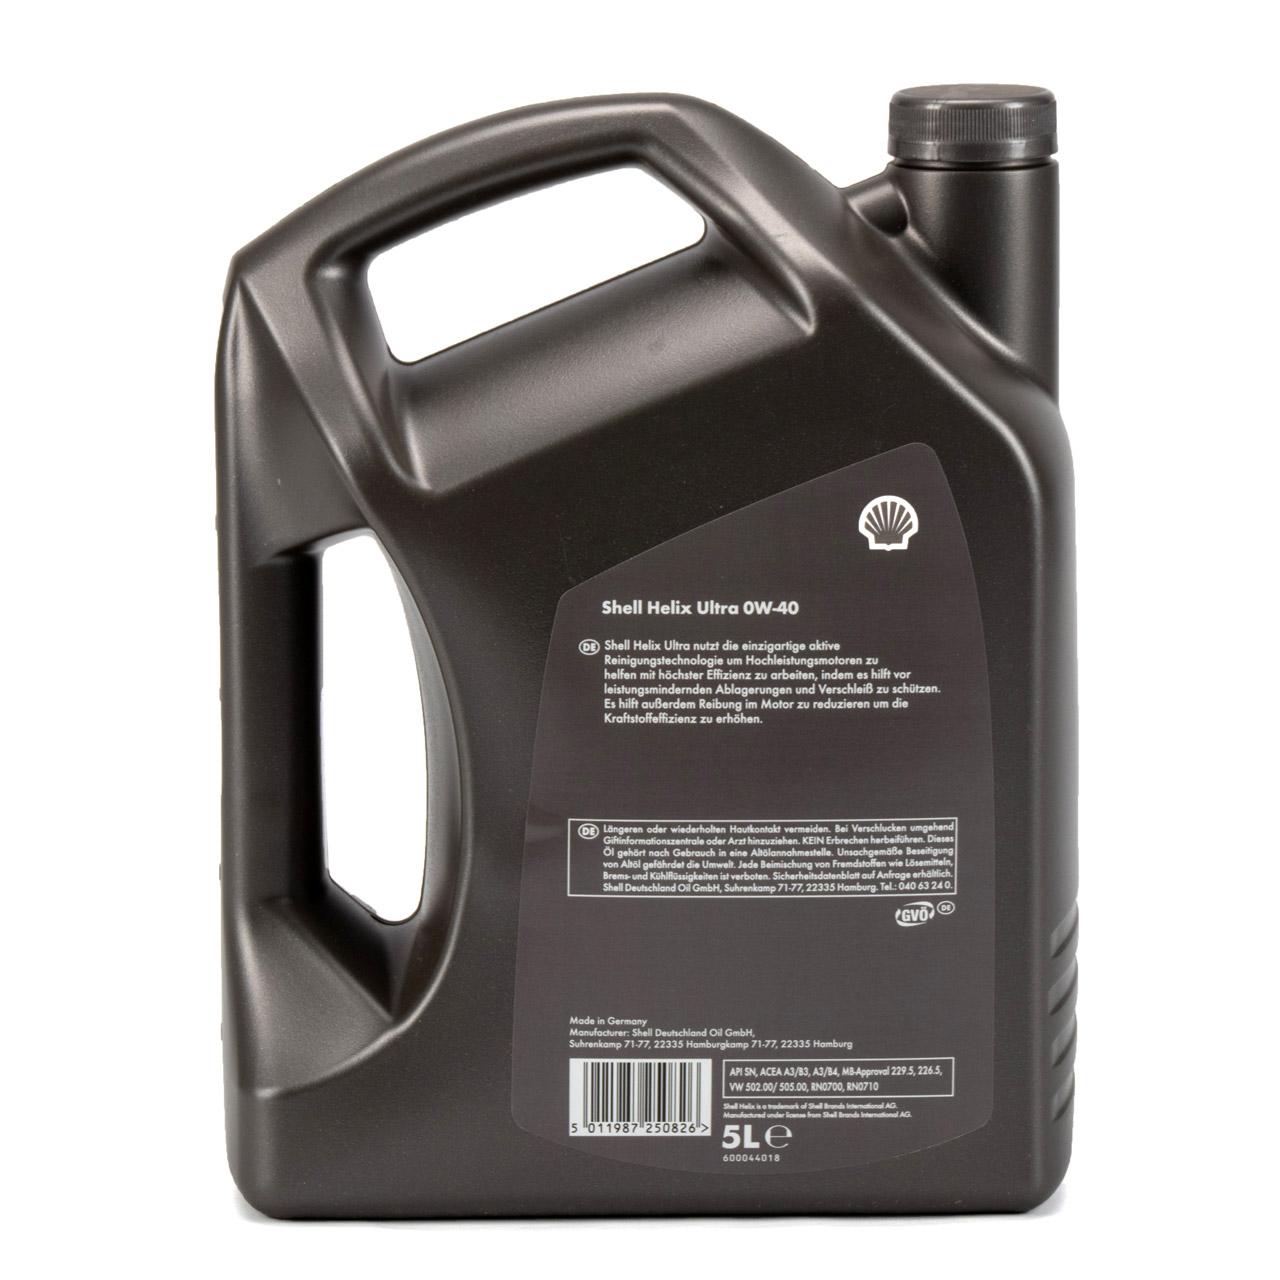 SHELL Motoröl Öl HELIX ULTRA 0W40 MB 229.5/226.5 VW 502.00/505.00 - 5L 5 Liter